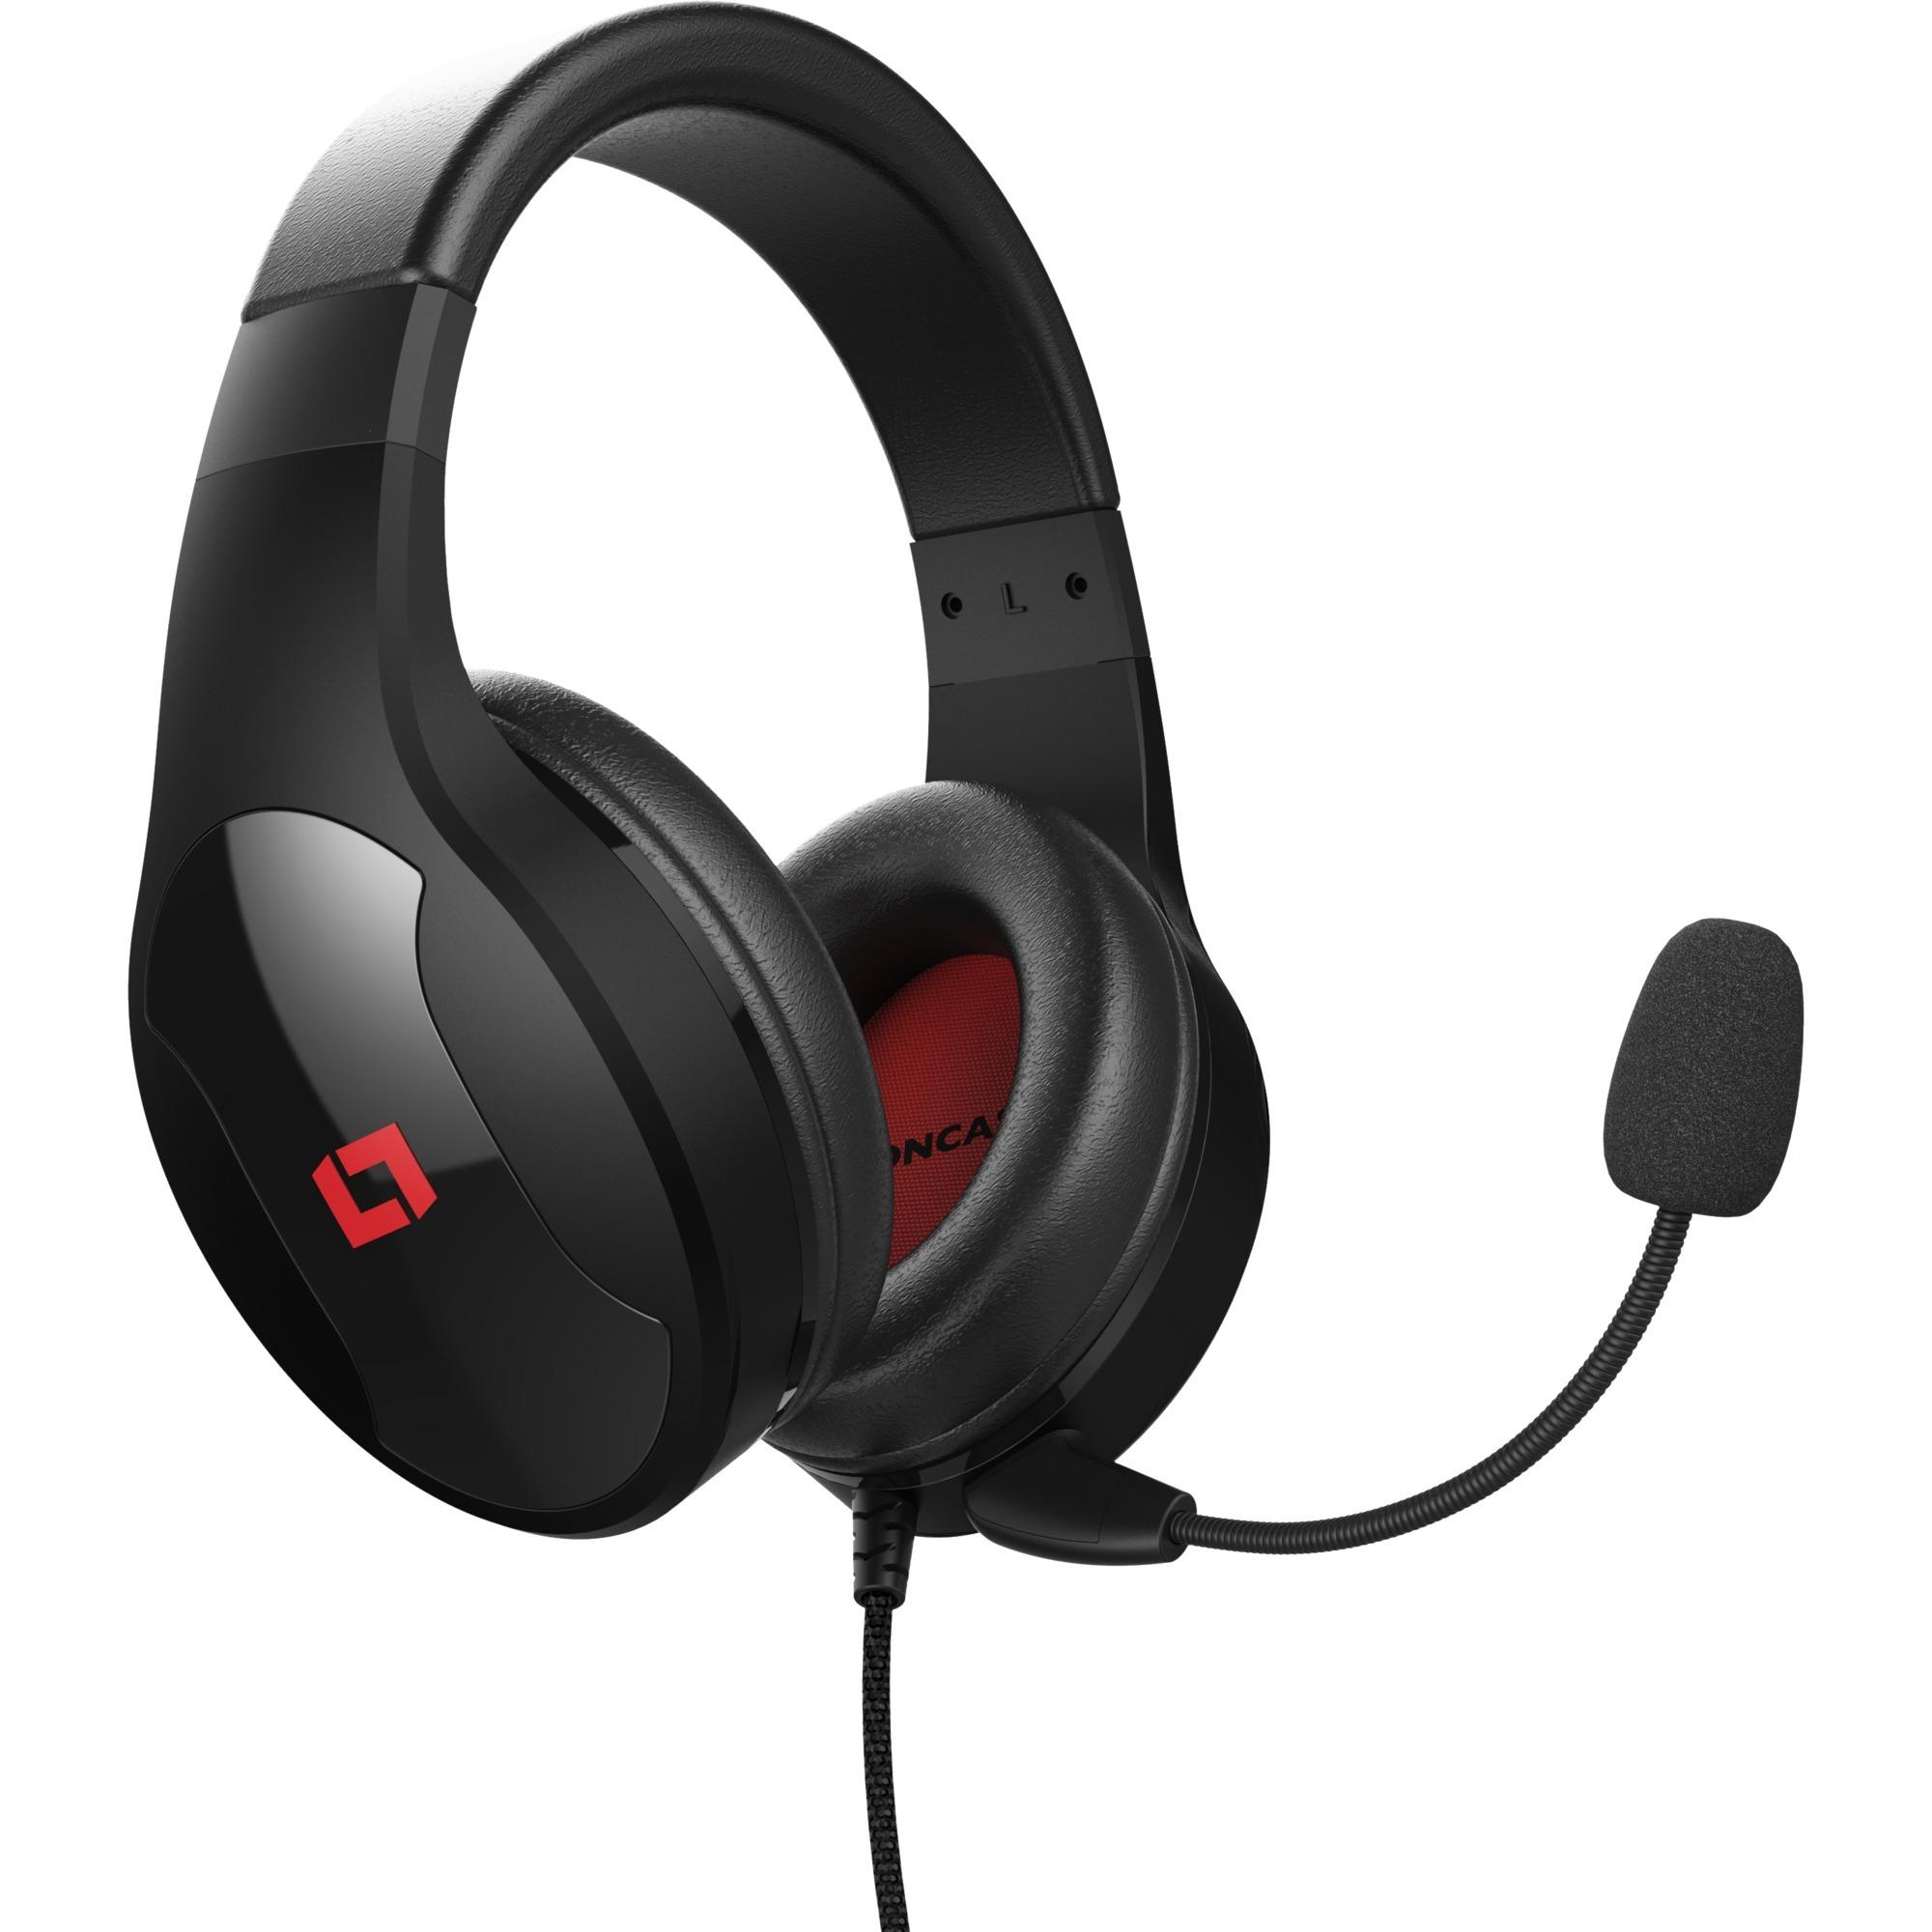 LX20 auricular con micrófono Binaural Diadema Negro, Rojo, Auriculares con micrófono